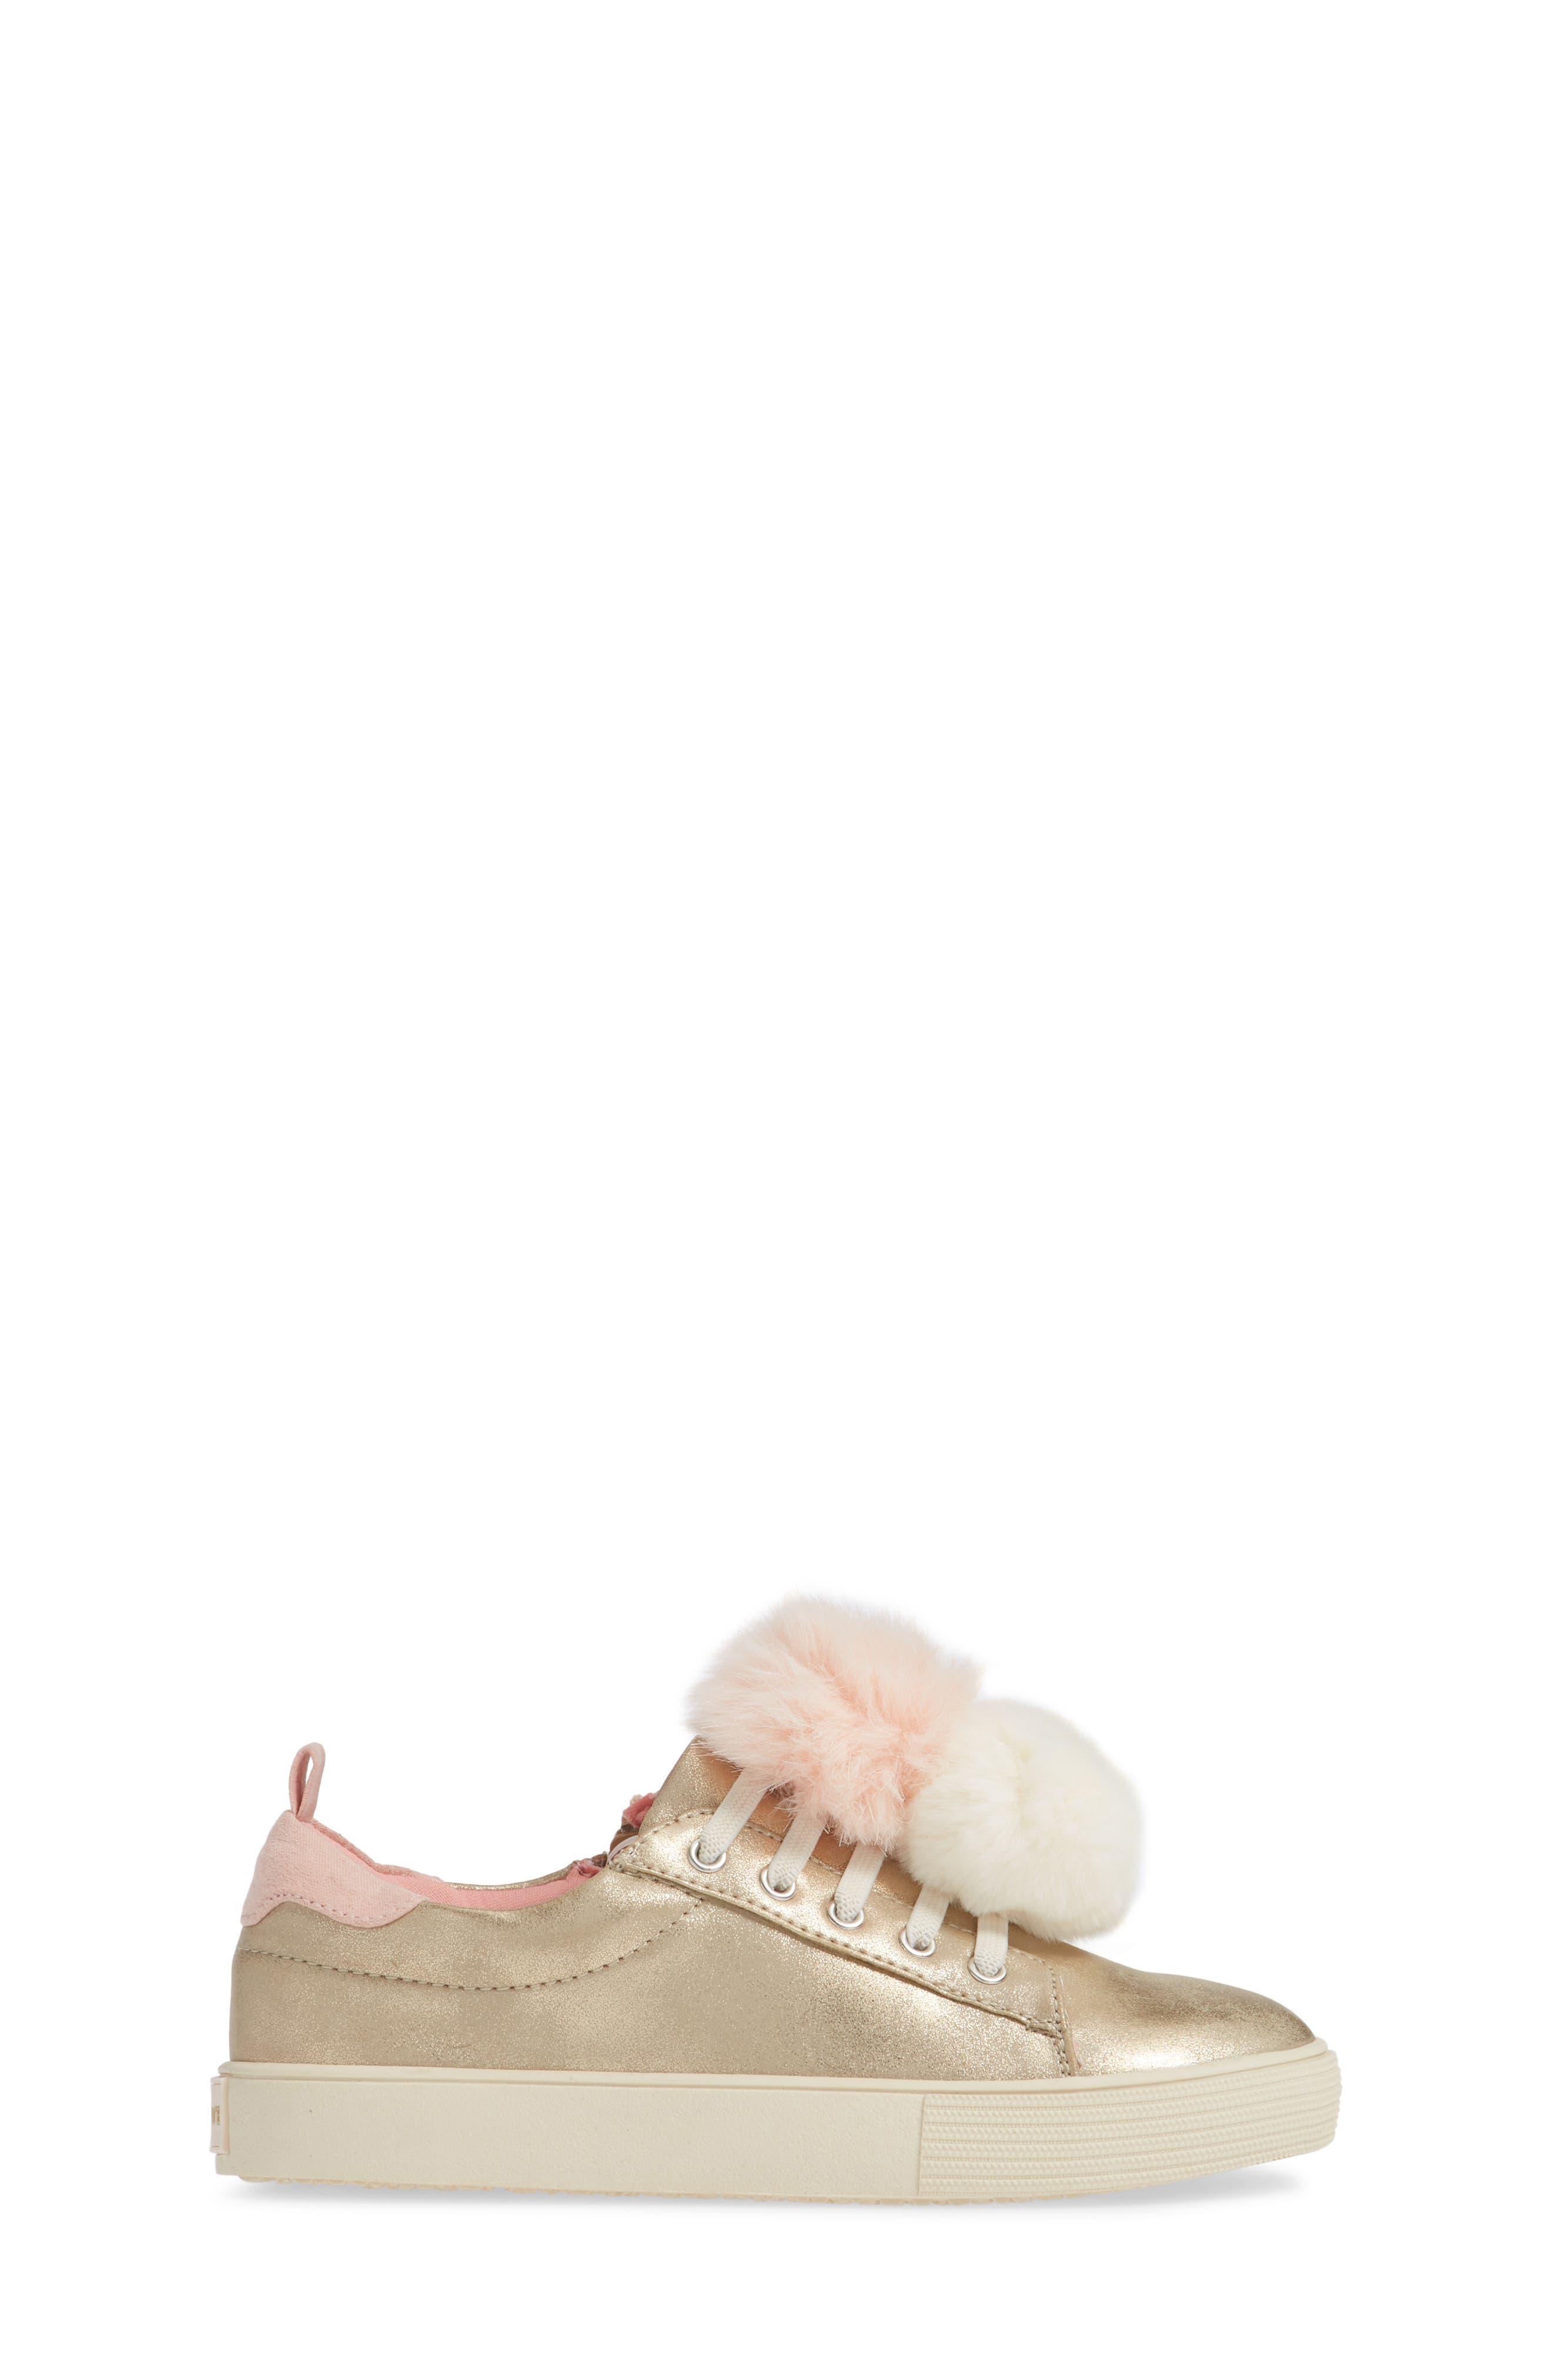 Millie Metallic Pom Sneaker,                             Alternate thumbnail 3, color,                             GOLD METALLIC FAUX LEATHER